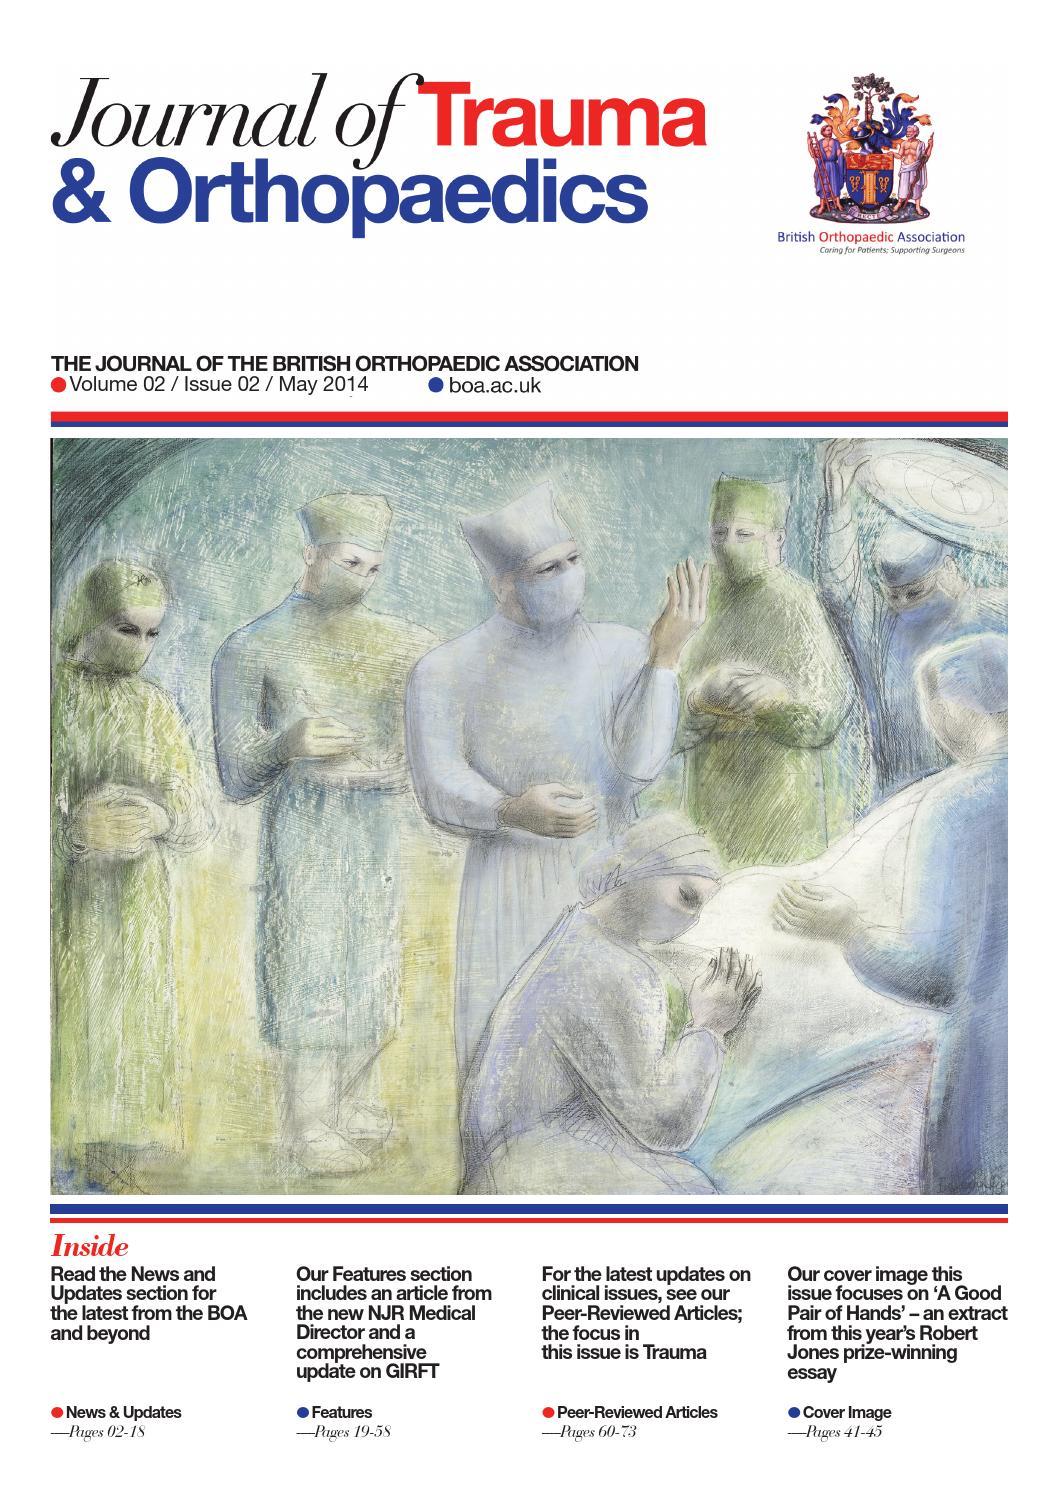 journal of trauma orthopaedics vol 2 iss 2 by british